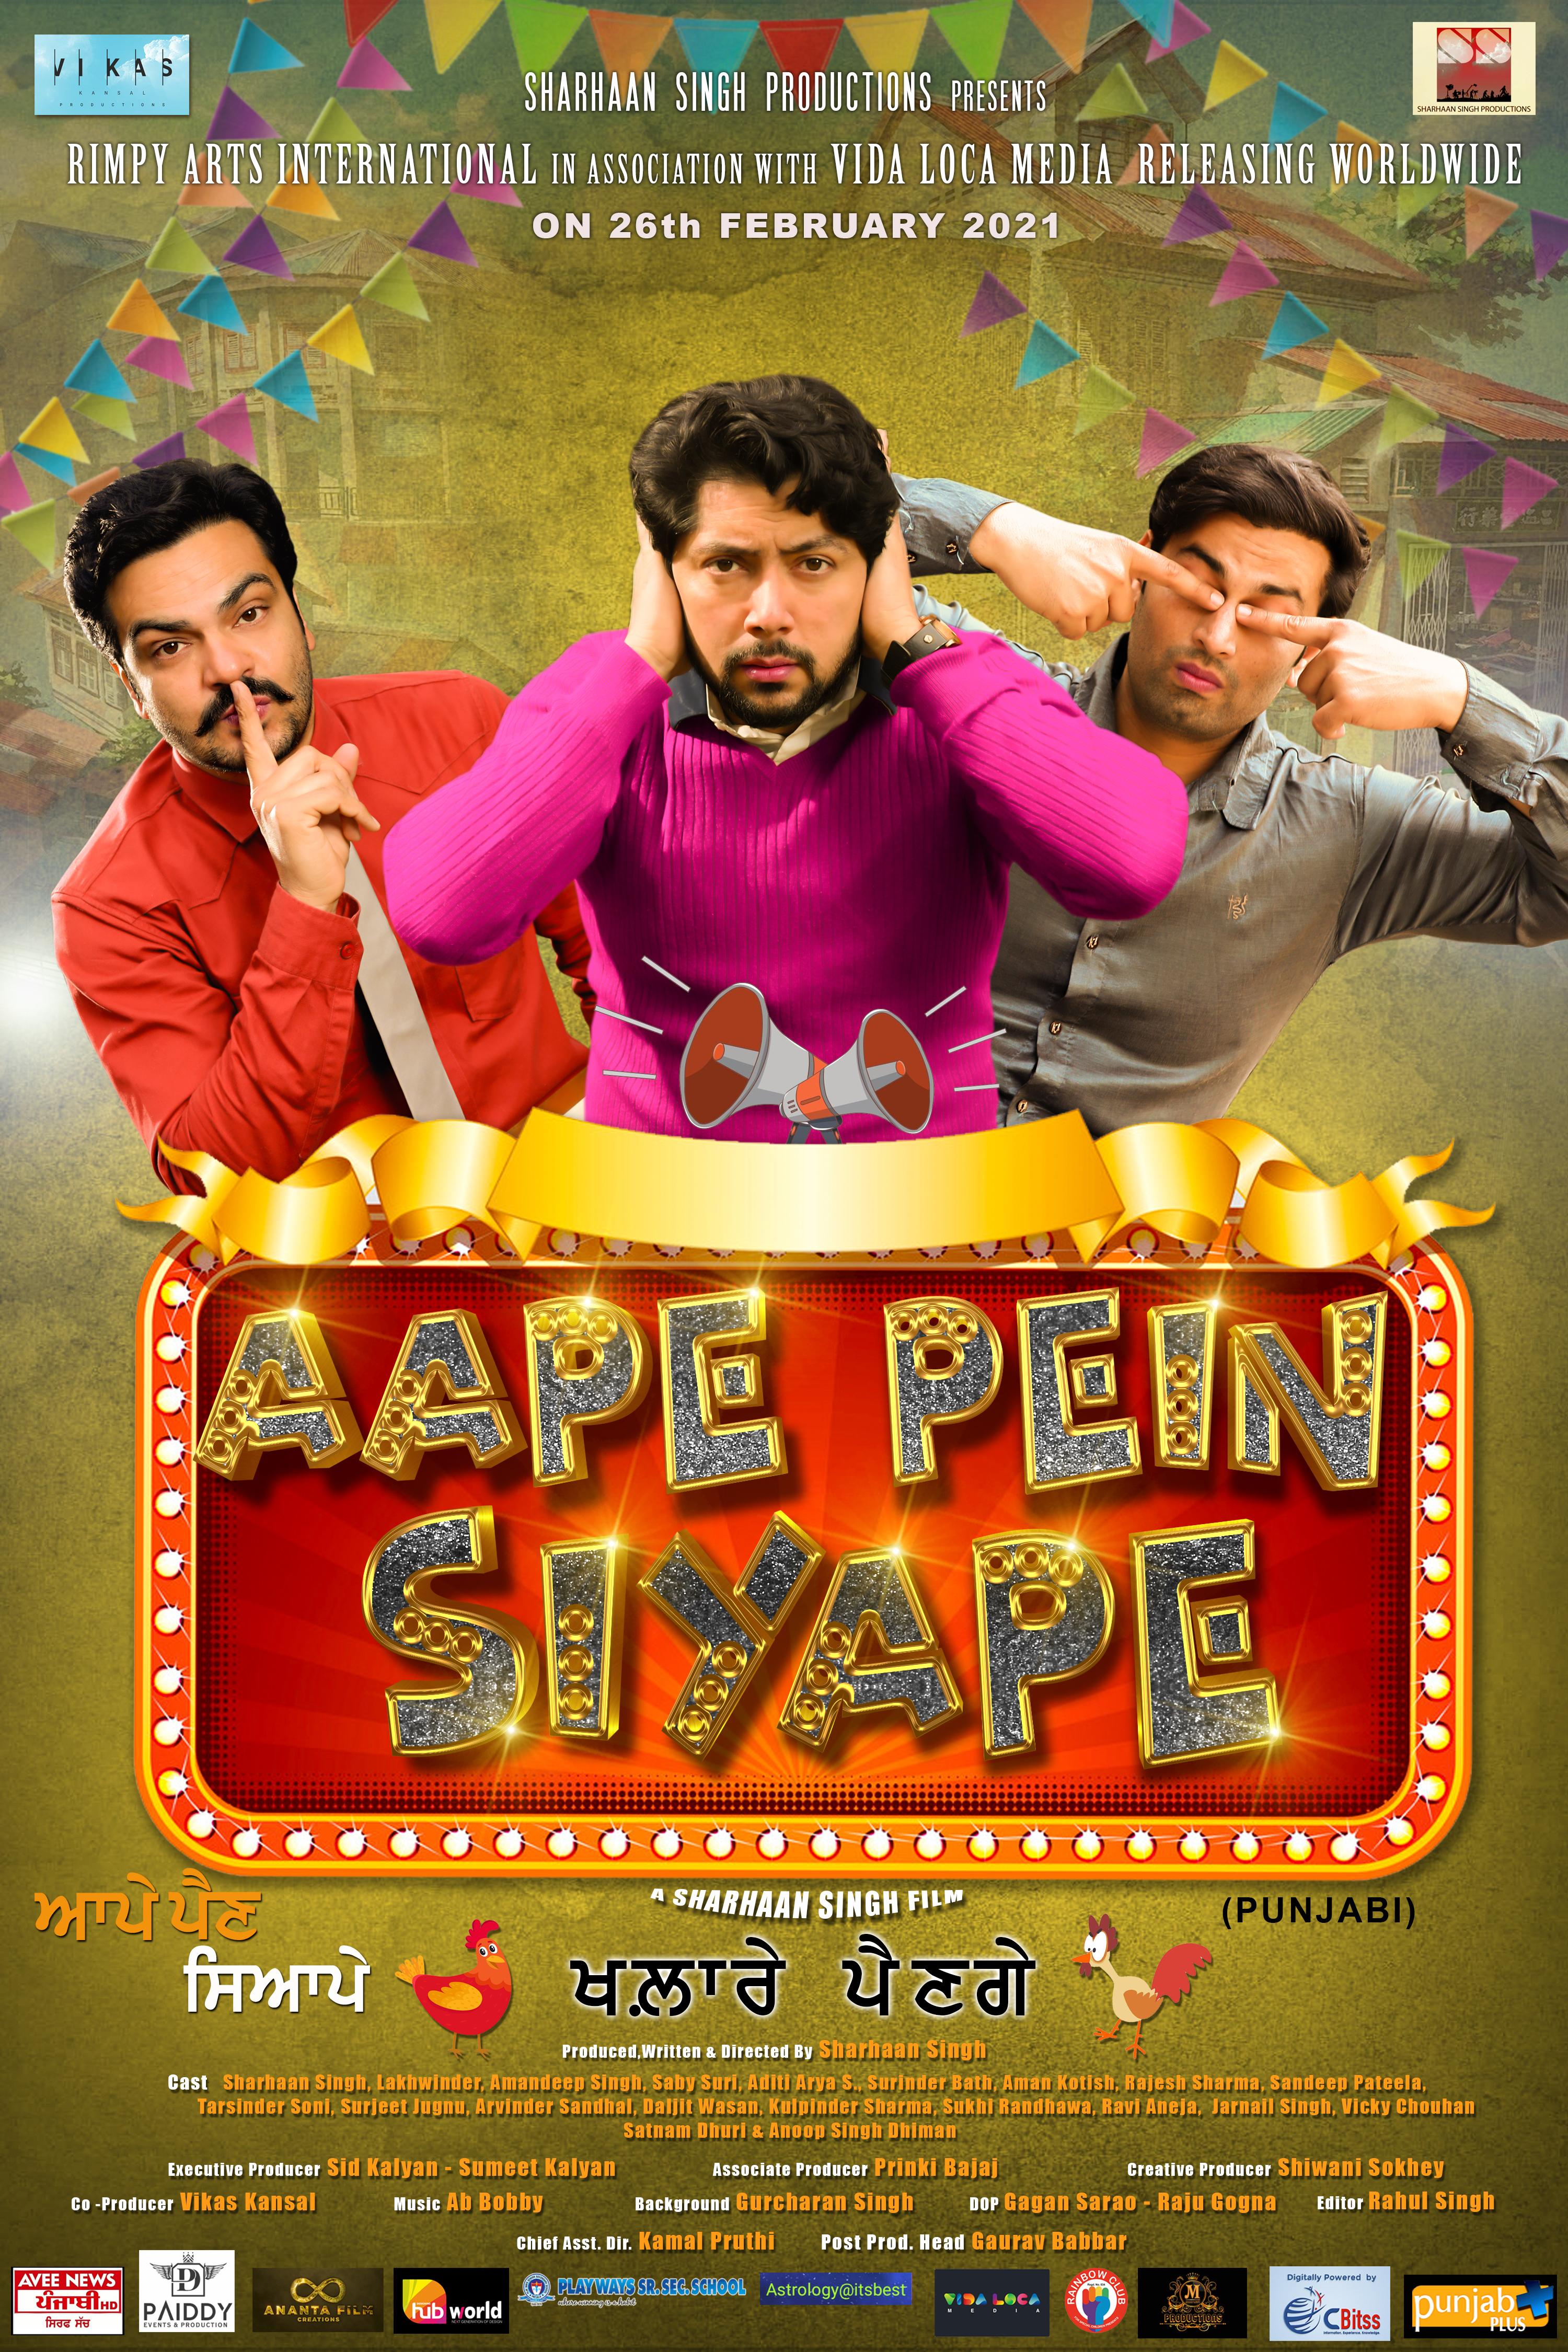 Aape Pein Siyappe 2021 Panjabi 1080p ZEE5 HDRip ESub 1.51GB Download